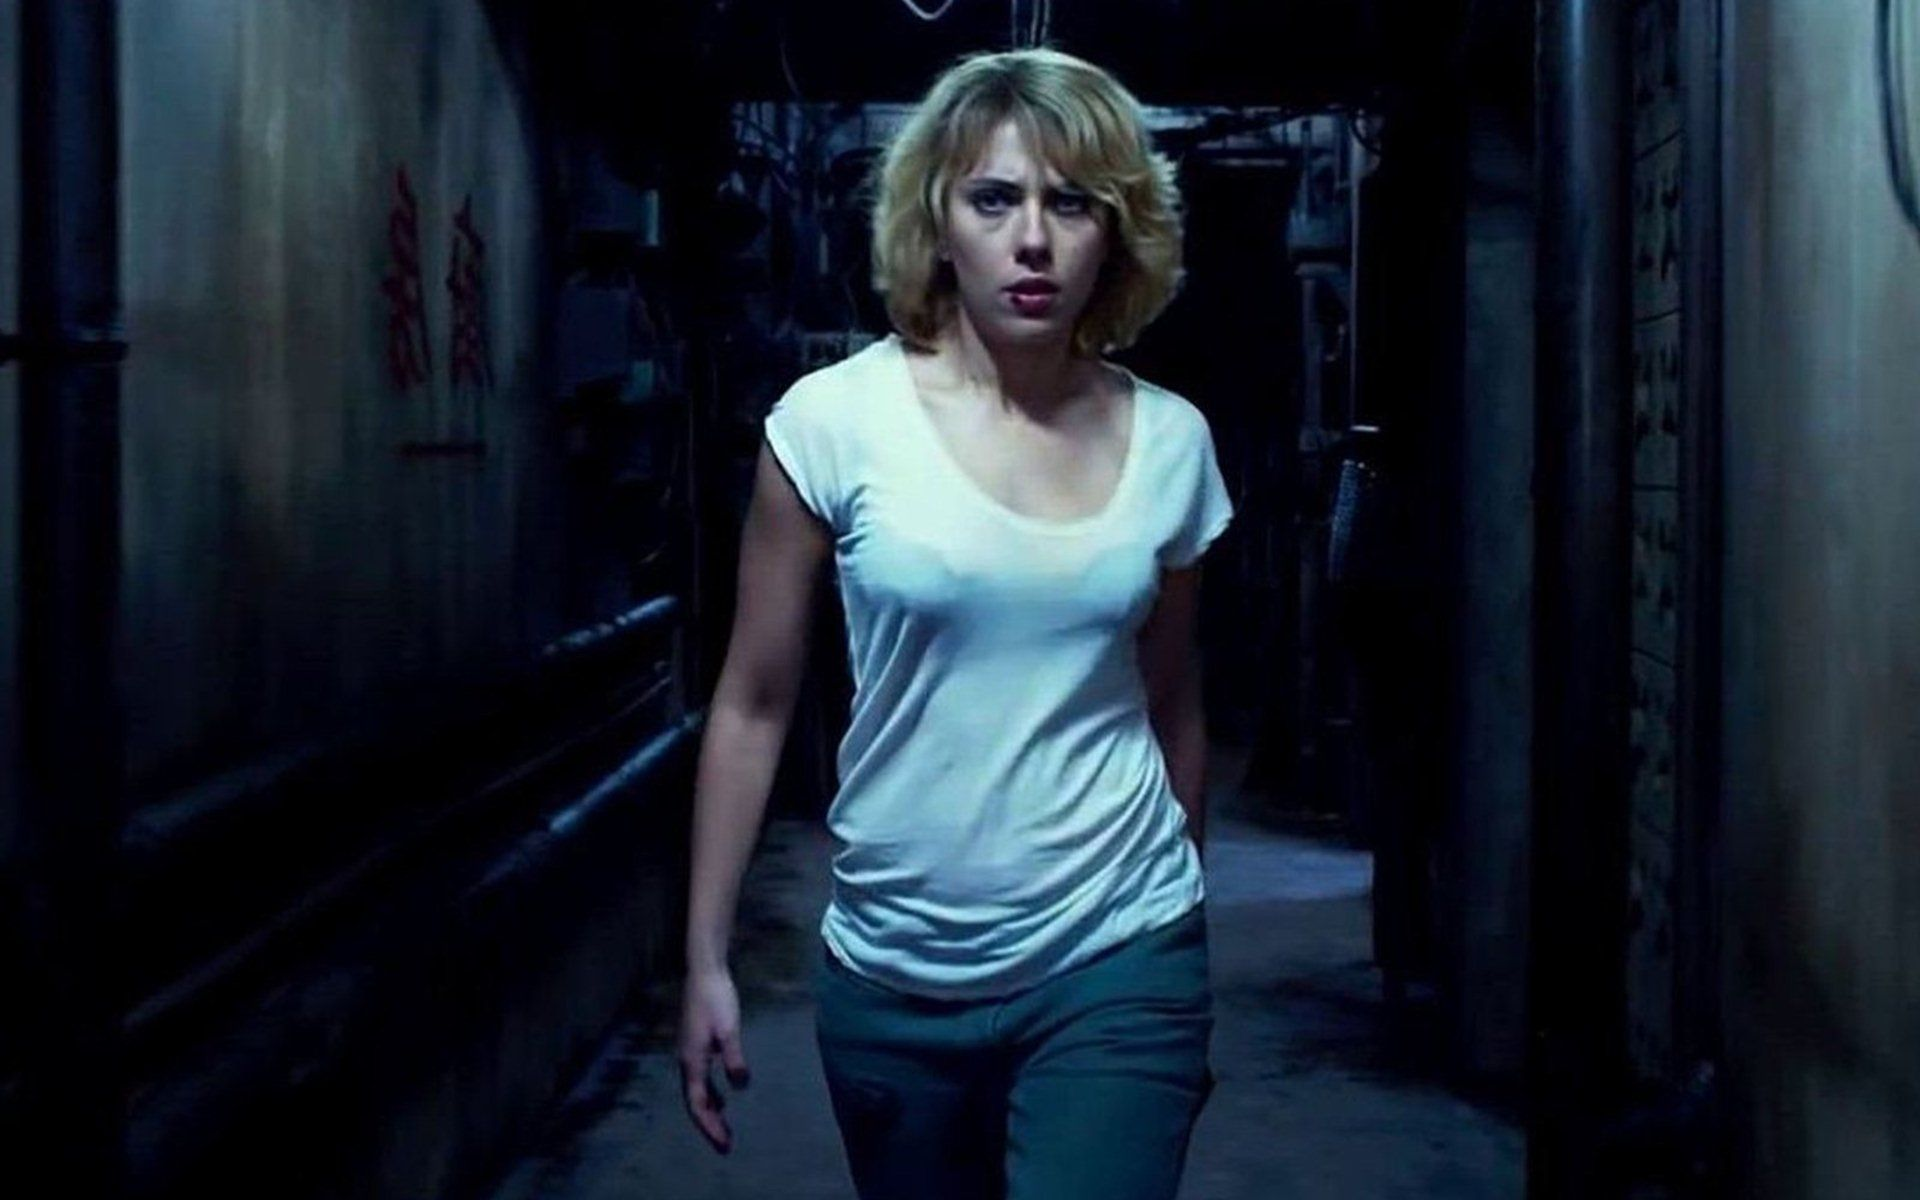 Lucy Movie Scarlett Johansson Wallpaper & Pictures, New